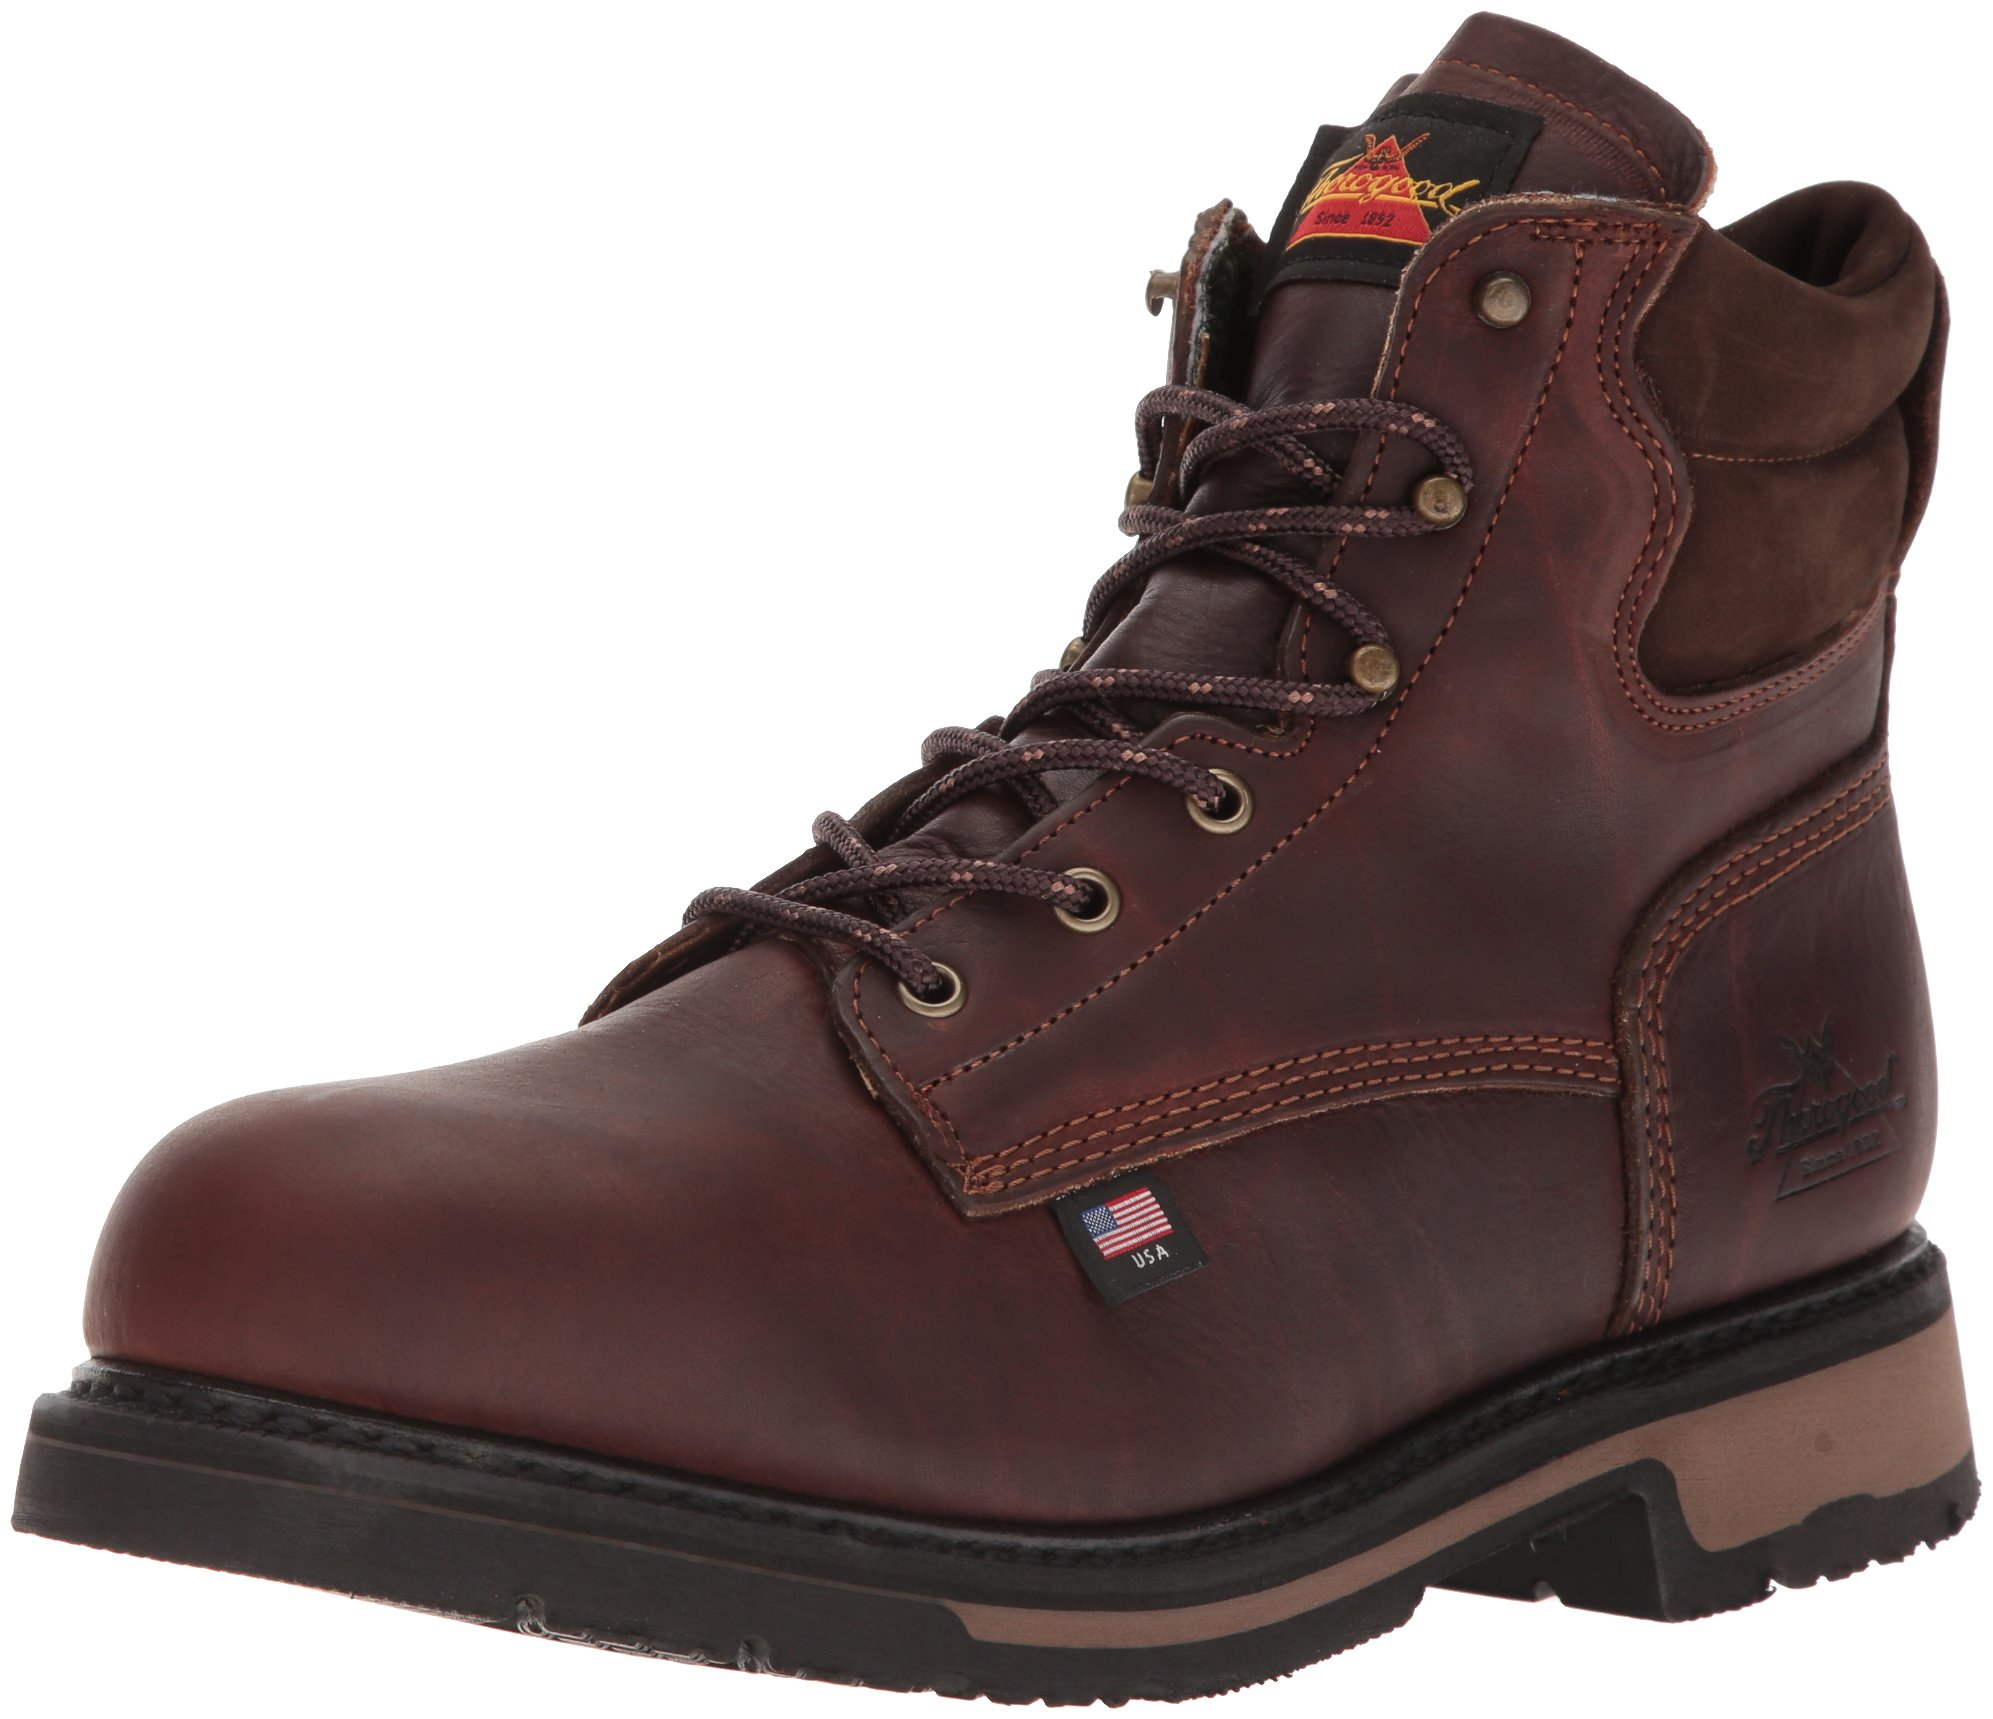 Thorogood American Heritage 6'' Safety Toe Boot, Walnut, 10.5 D US